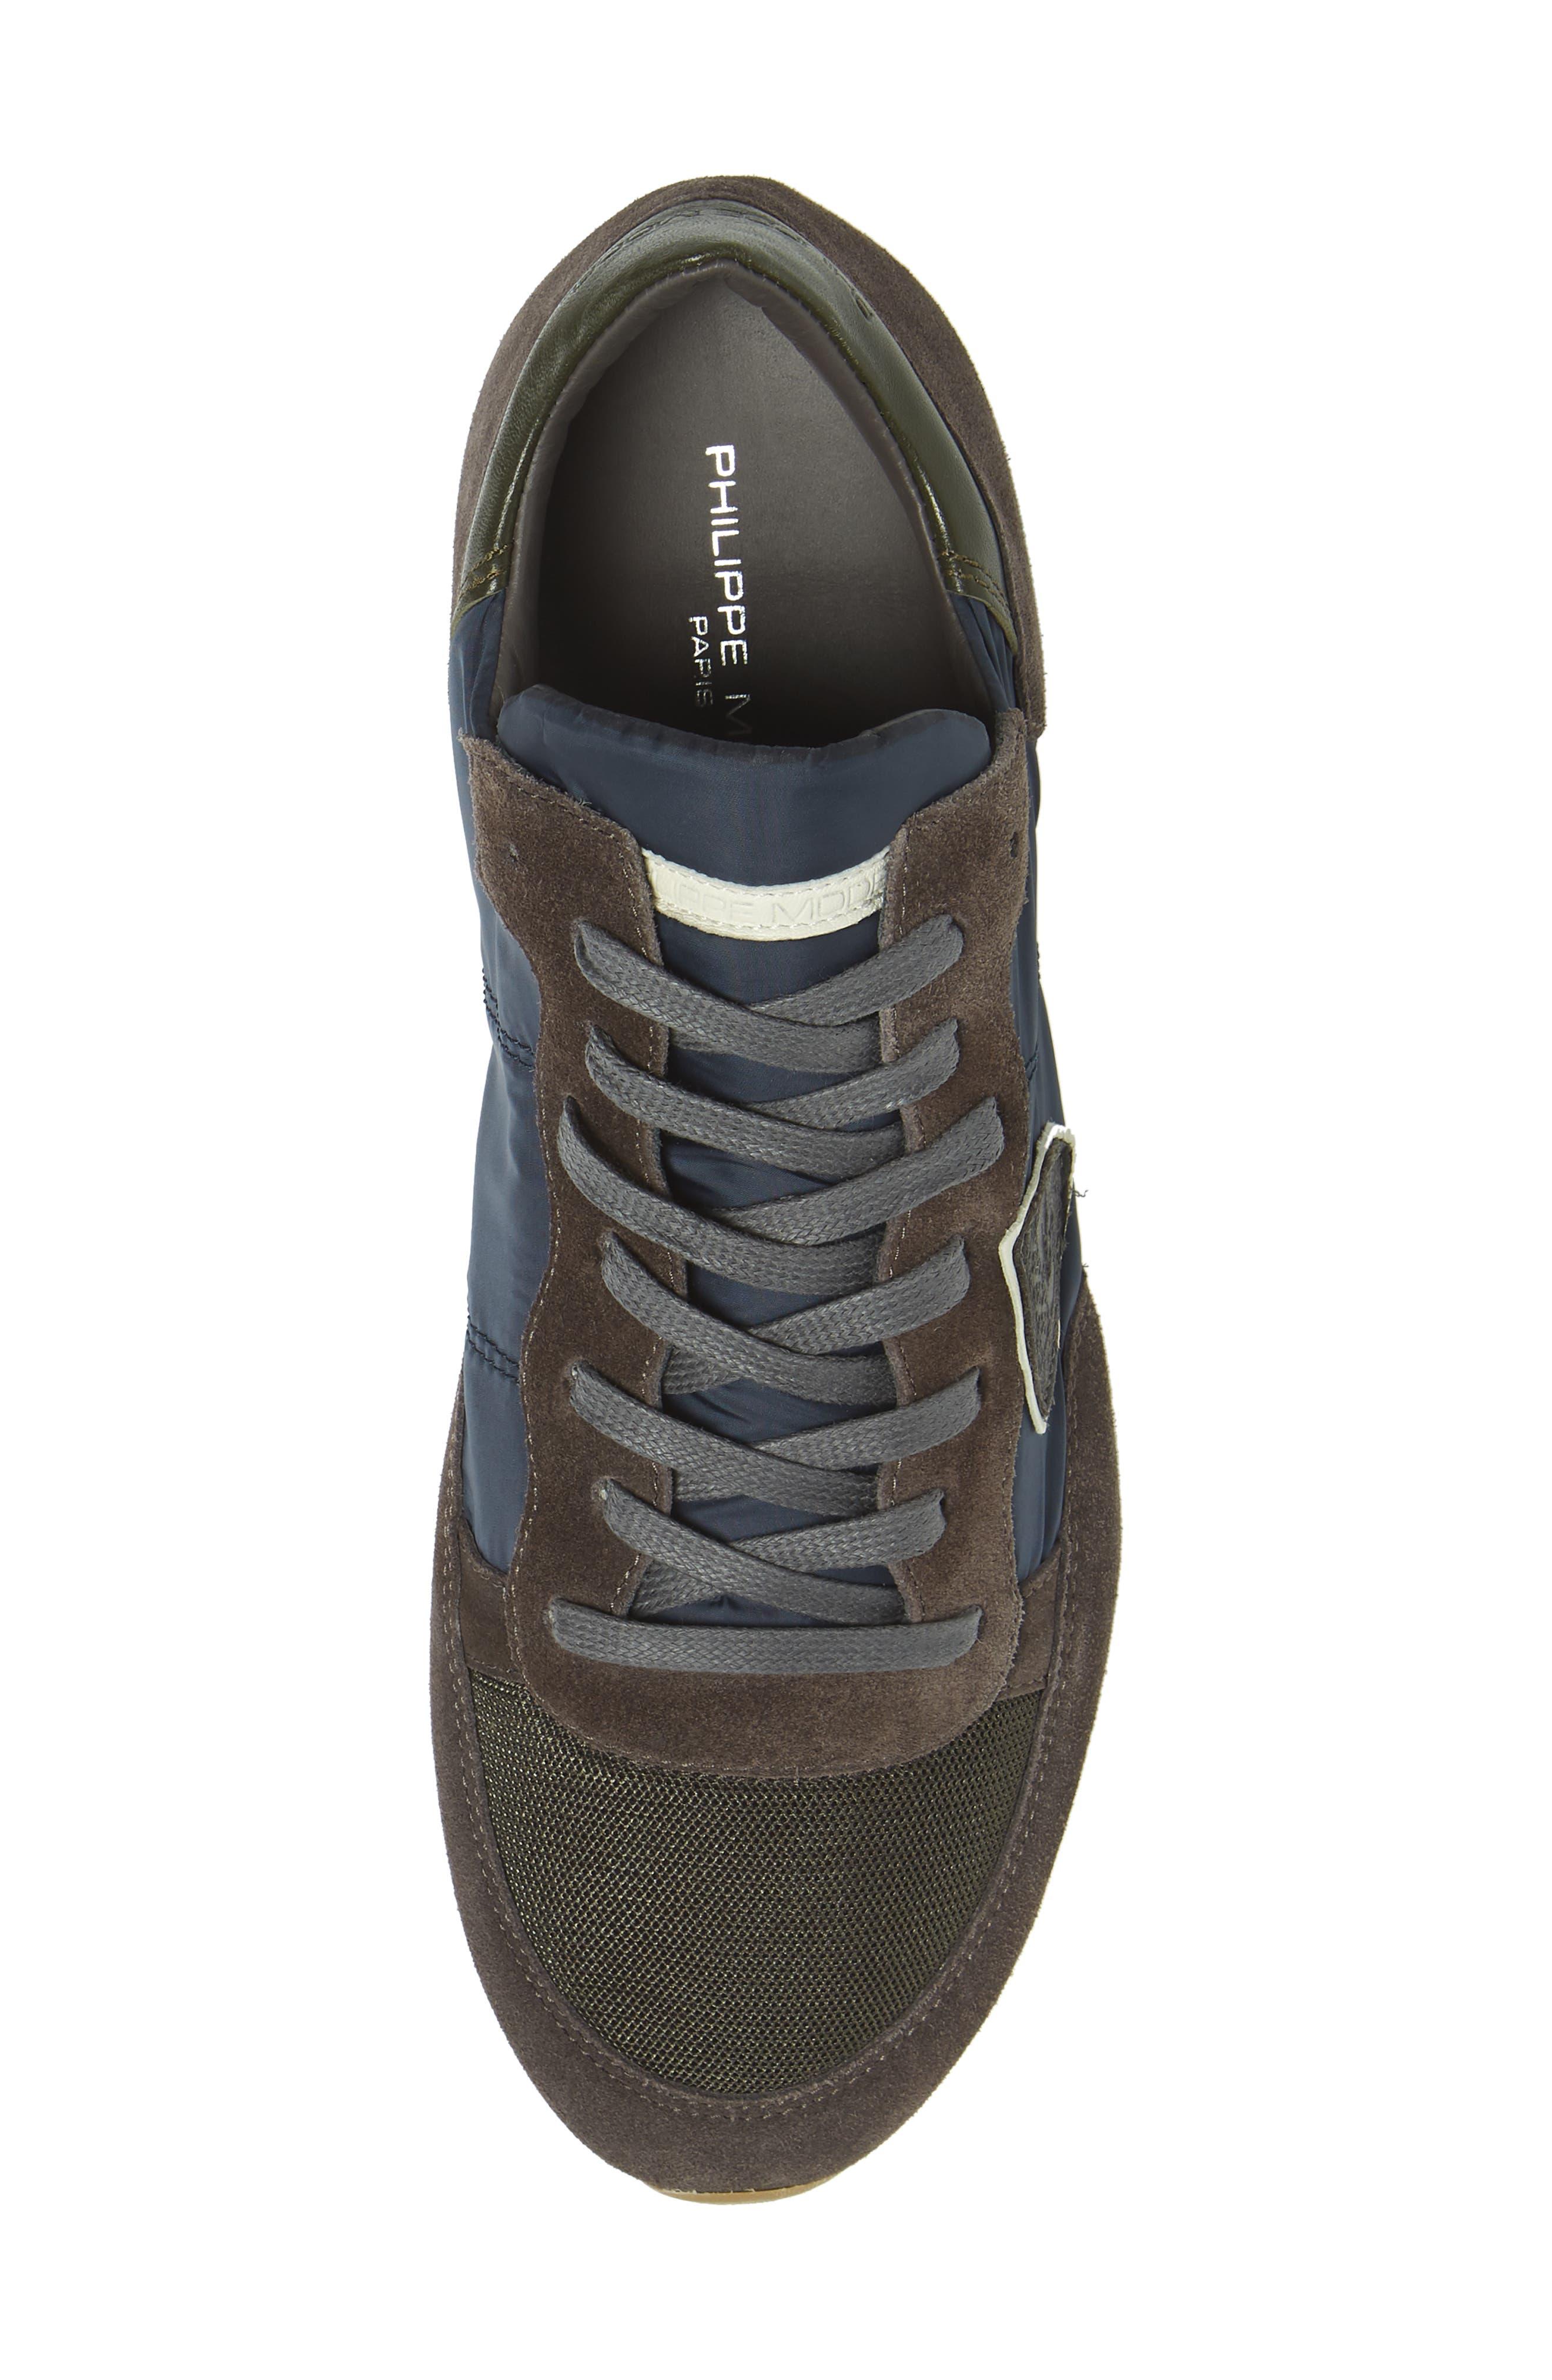 Tropez Low Top Sneaker,                             Alternate thumbnail 5, color,                             BLUE/ GREY